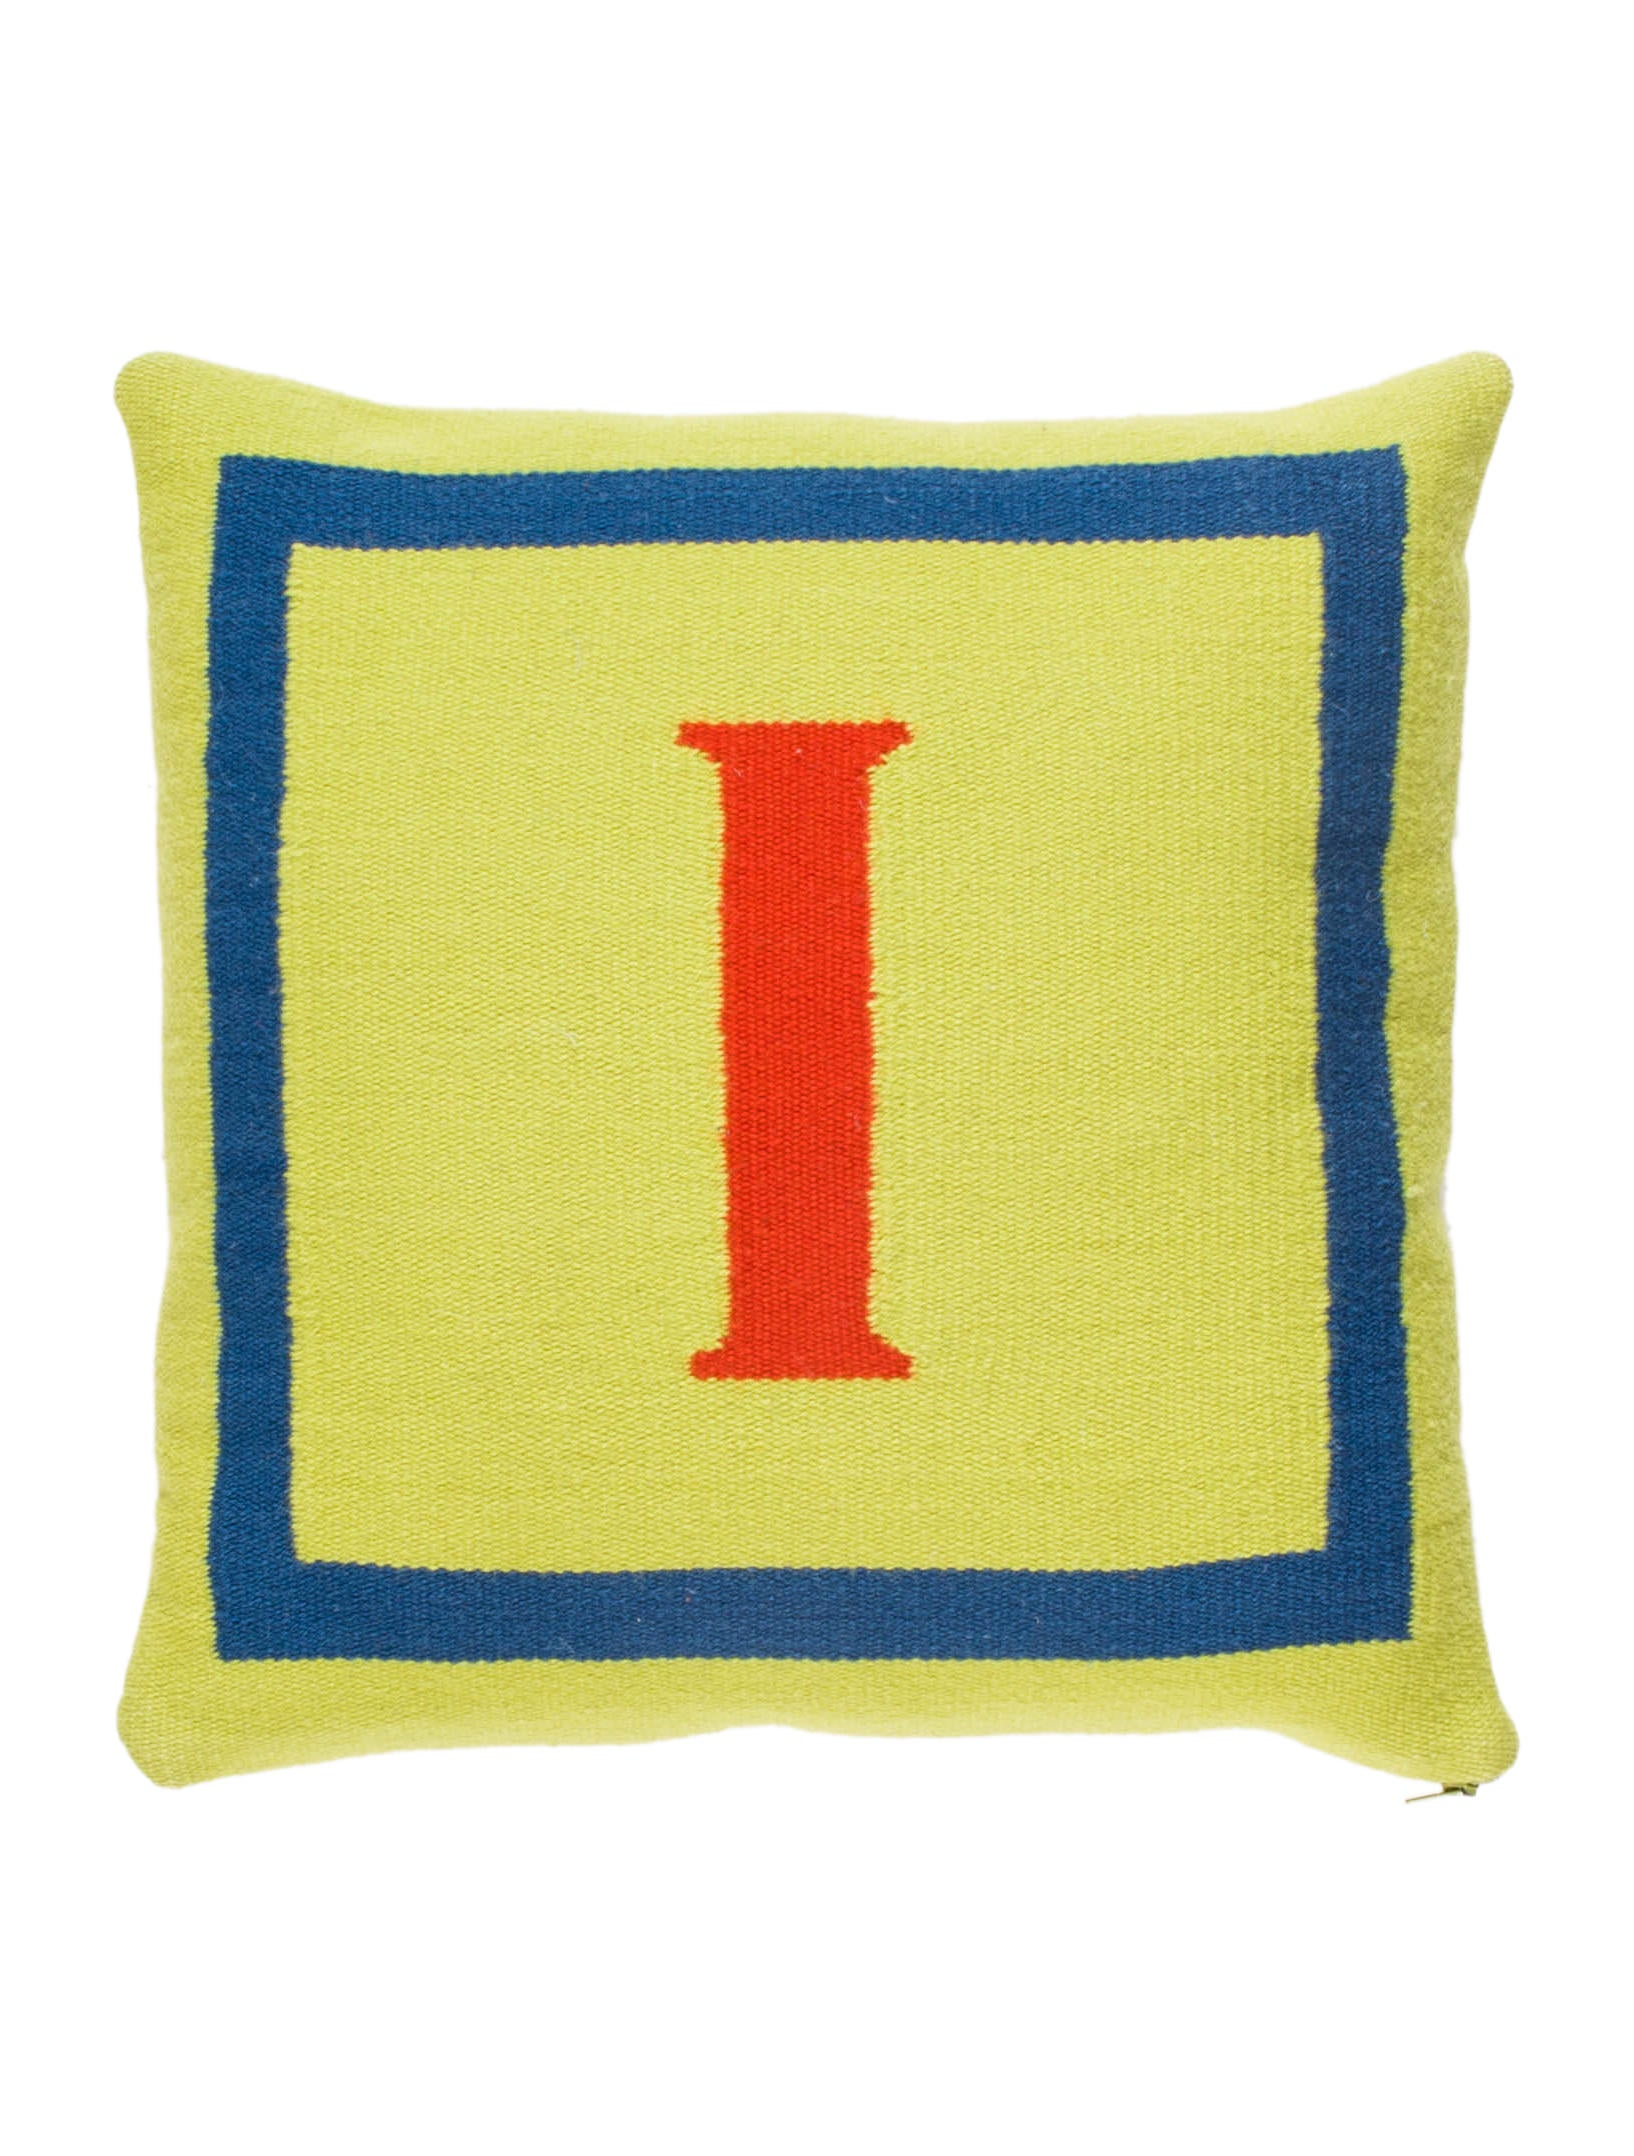 Letter L Throw Pillow : Jonathan Adler Letter Throw Pillow - Bedding And Bath - JTADL20607 The RealReal